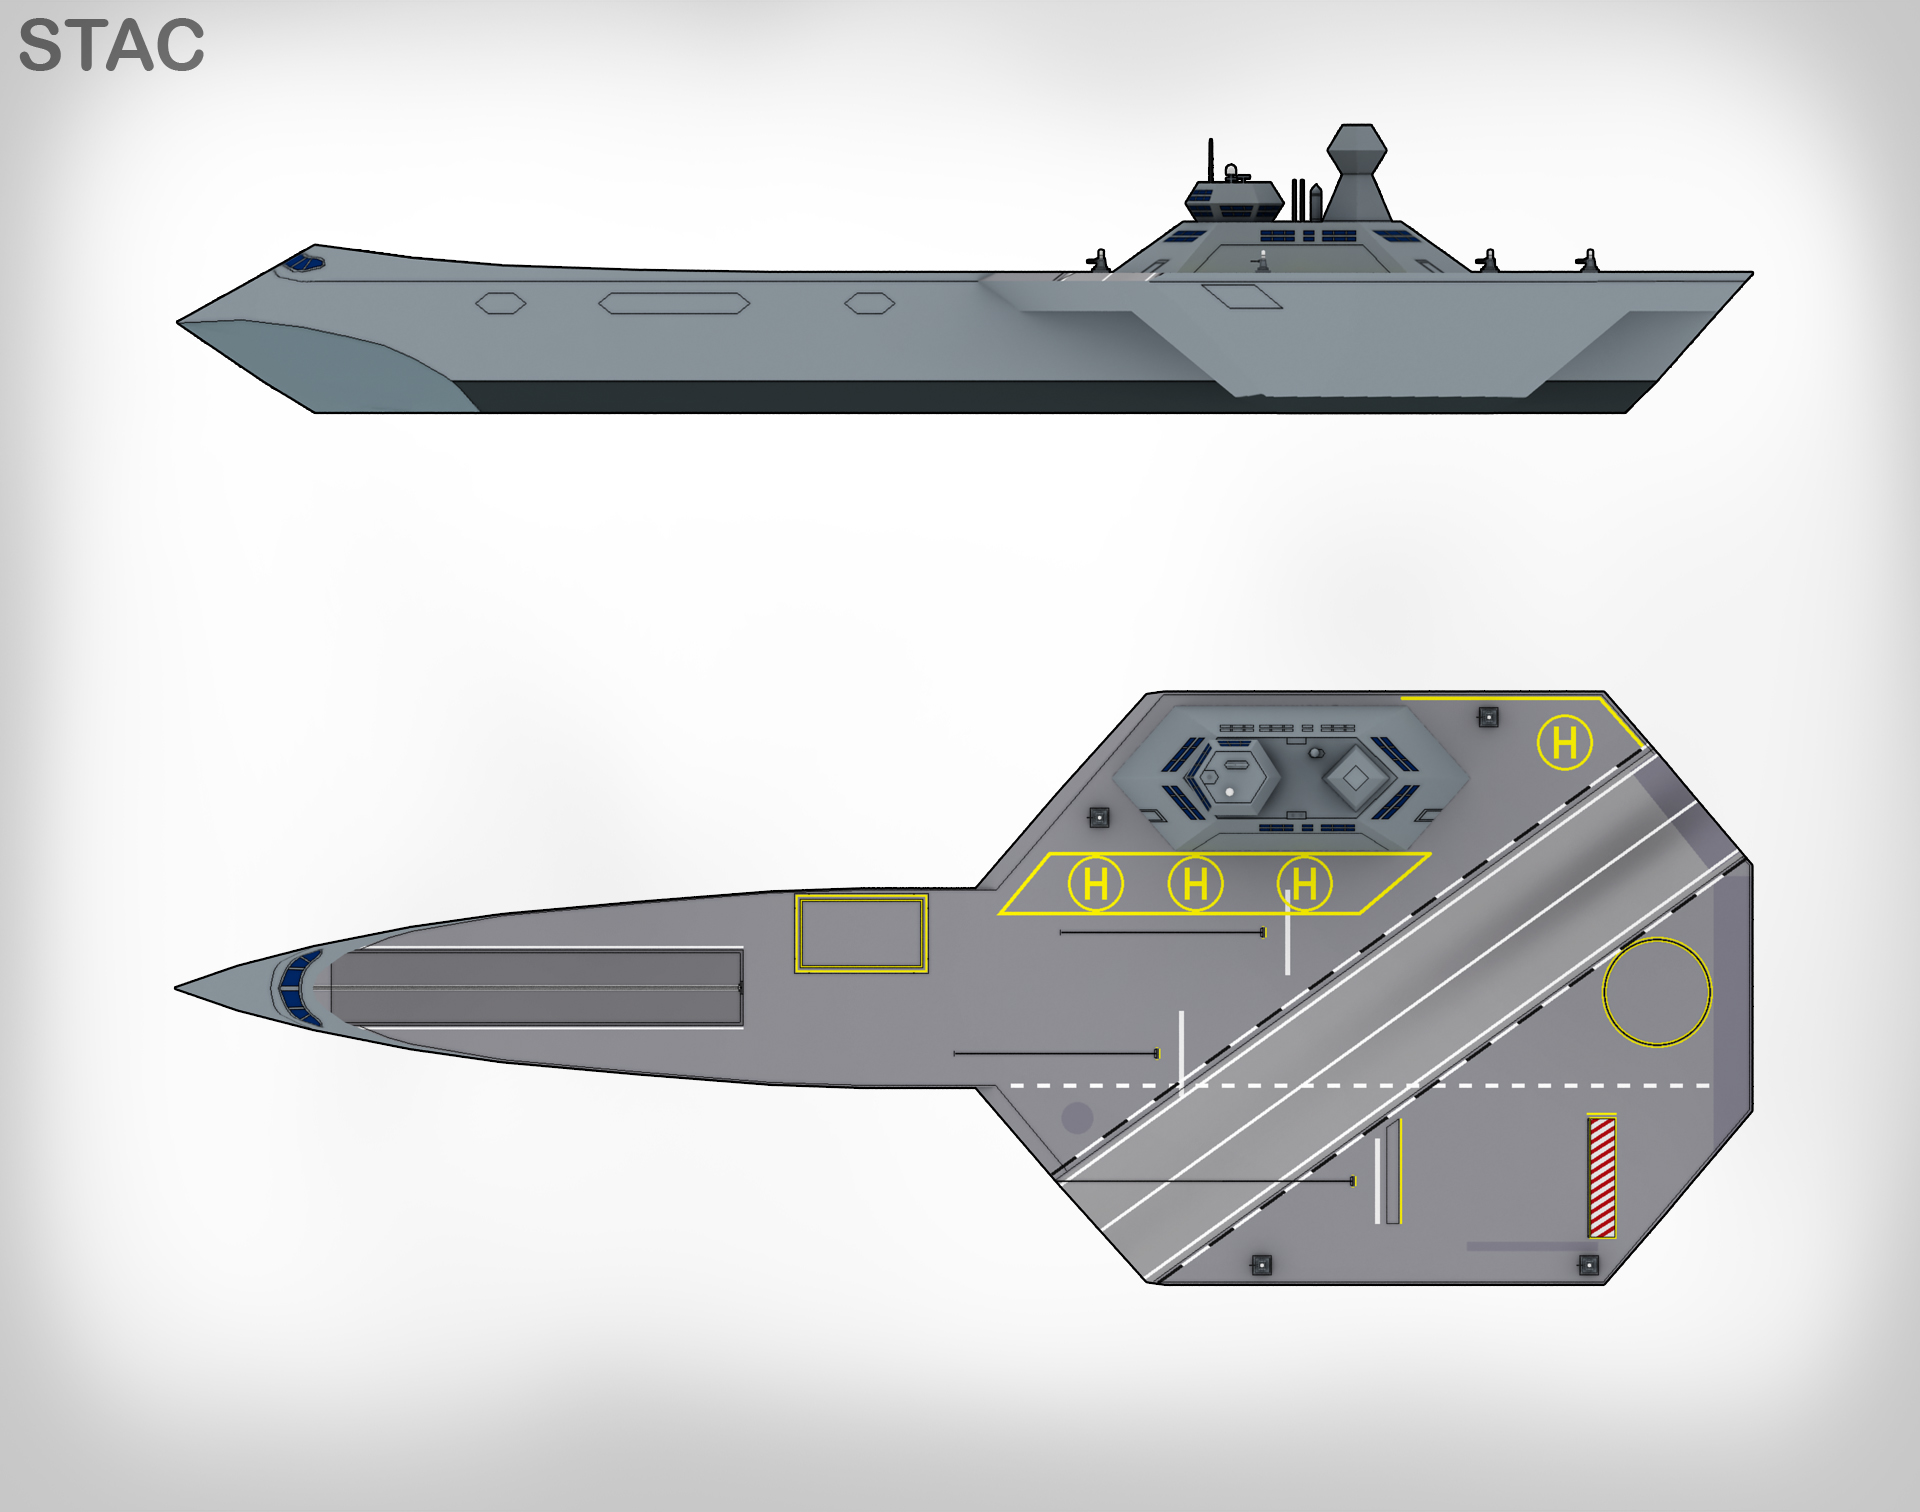 aircraft design project report pdf